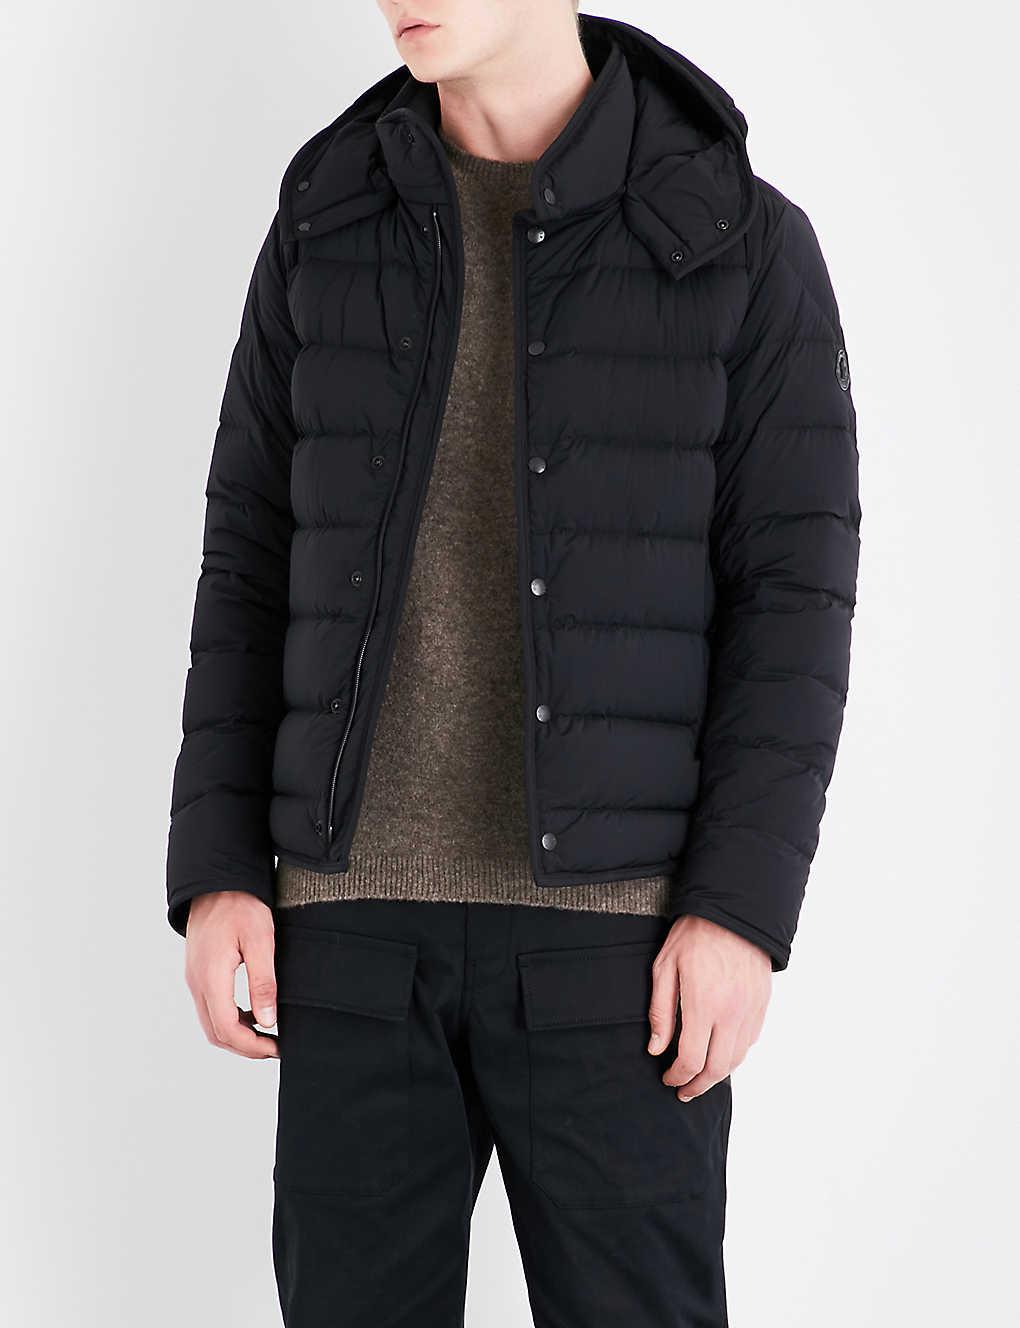 moncler nazaire jacket